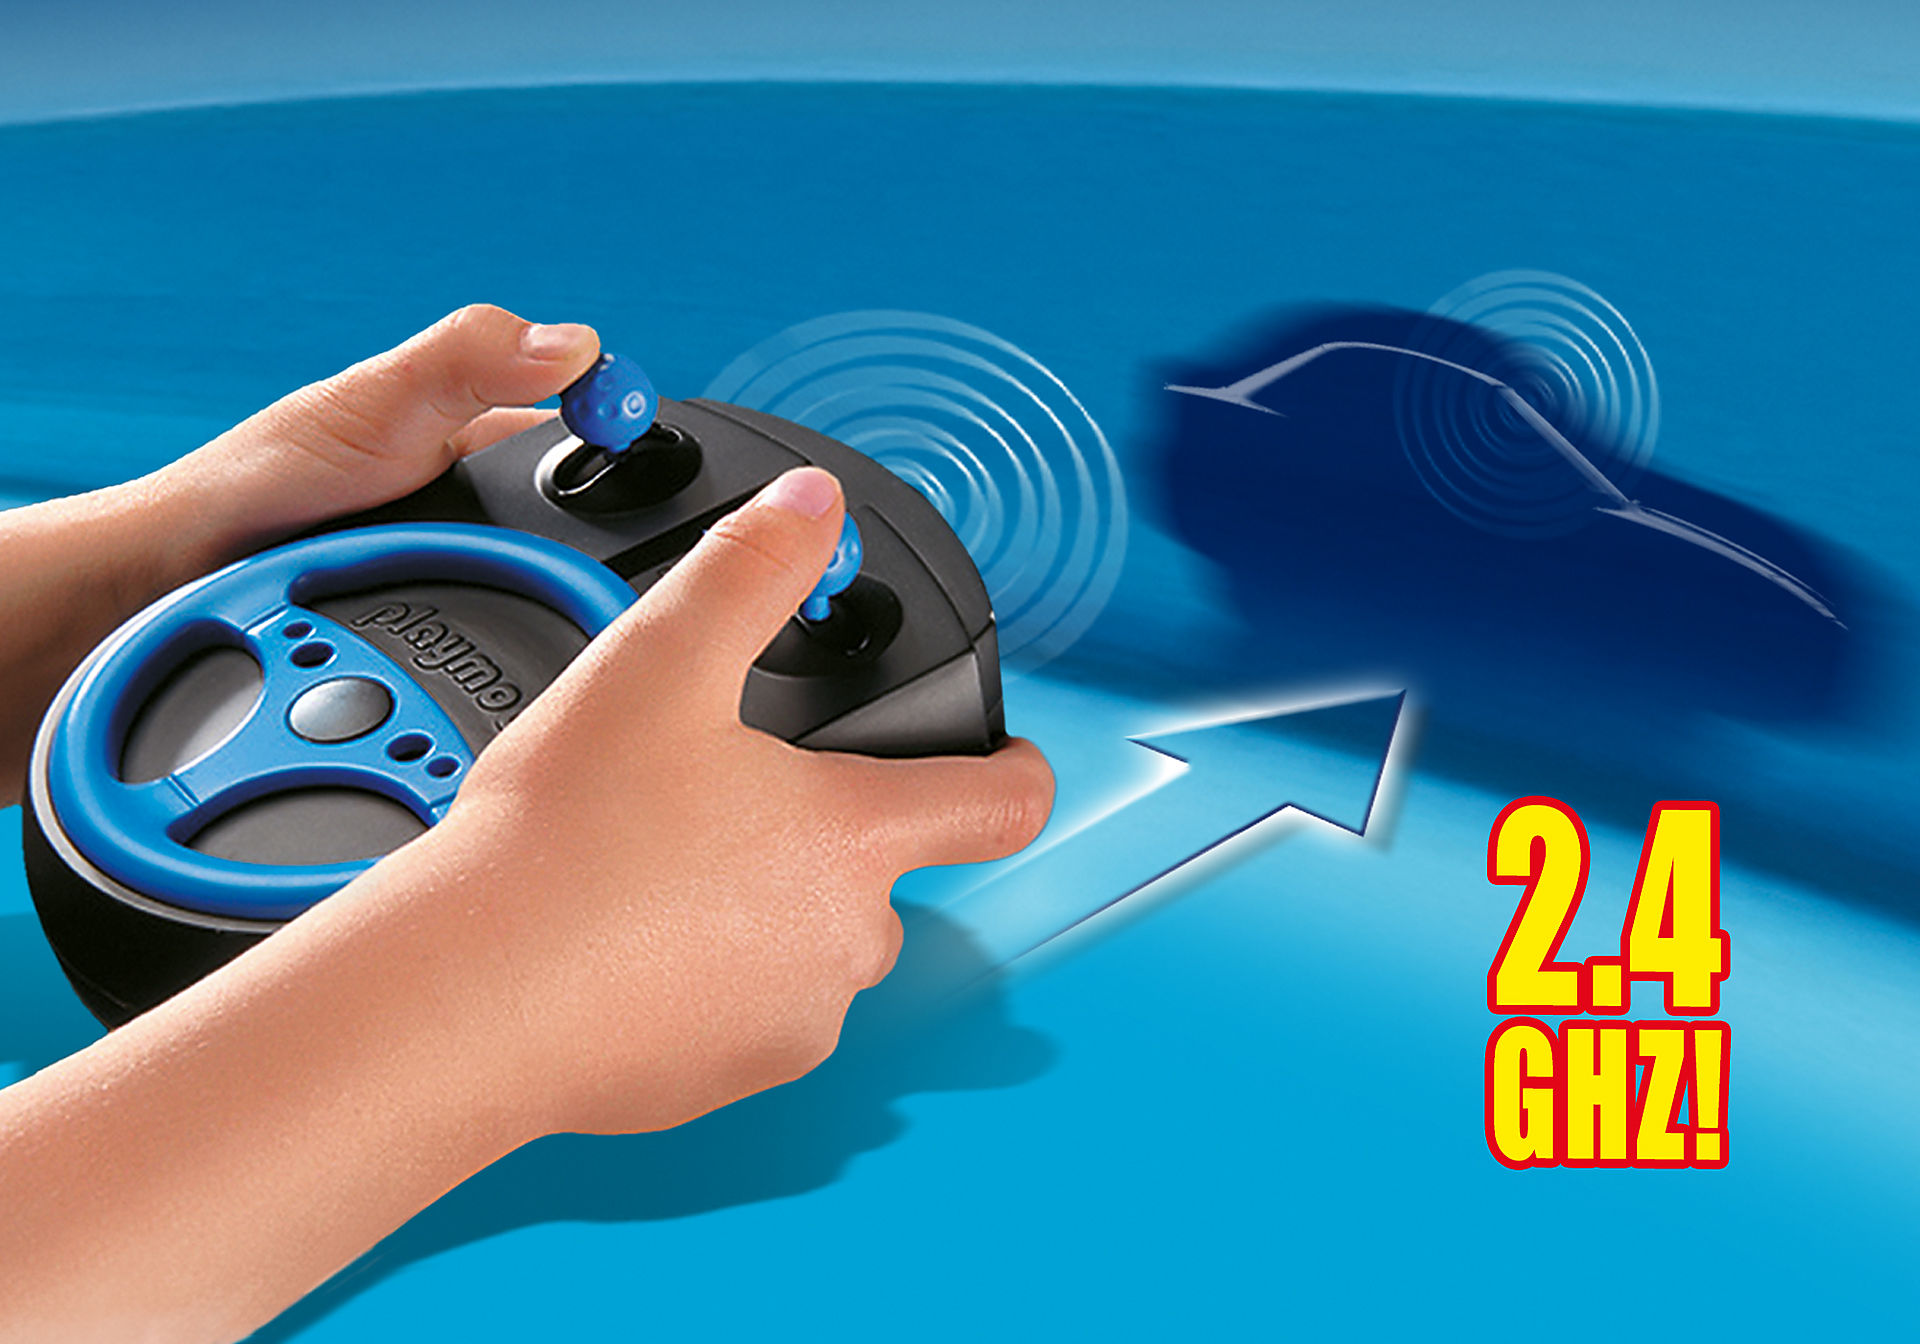 http://media.playmobil.com/i/playmobil/6914_product_extra2/Modulo radiocomandato (2,4 GHz)